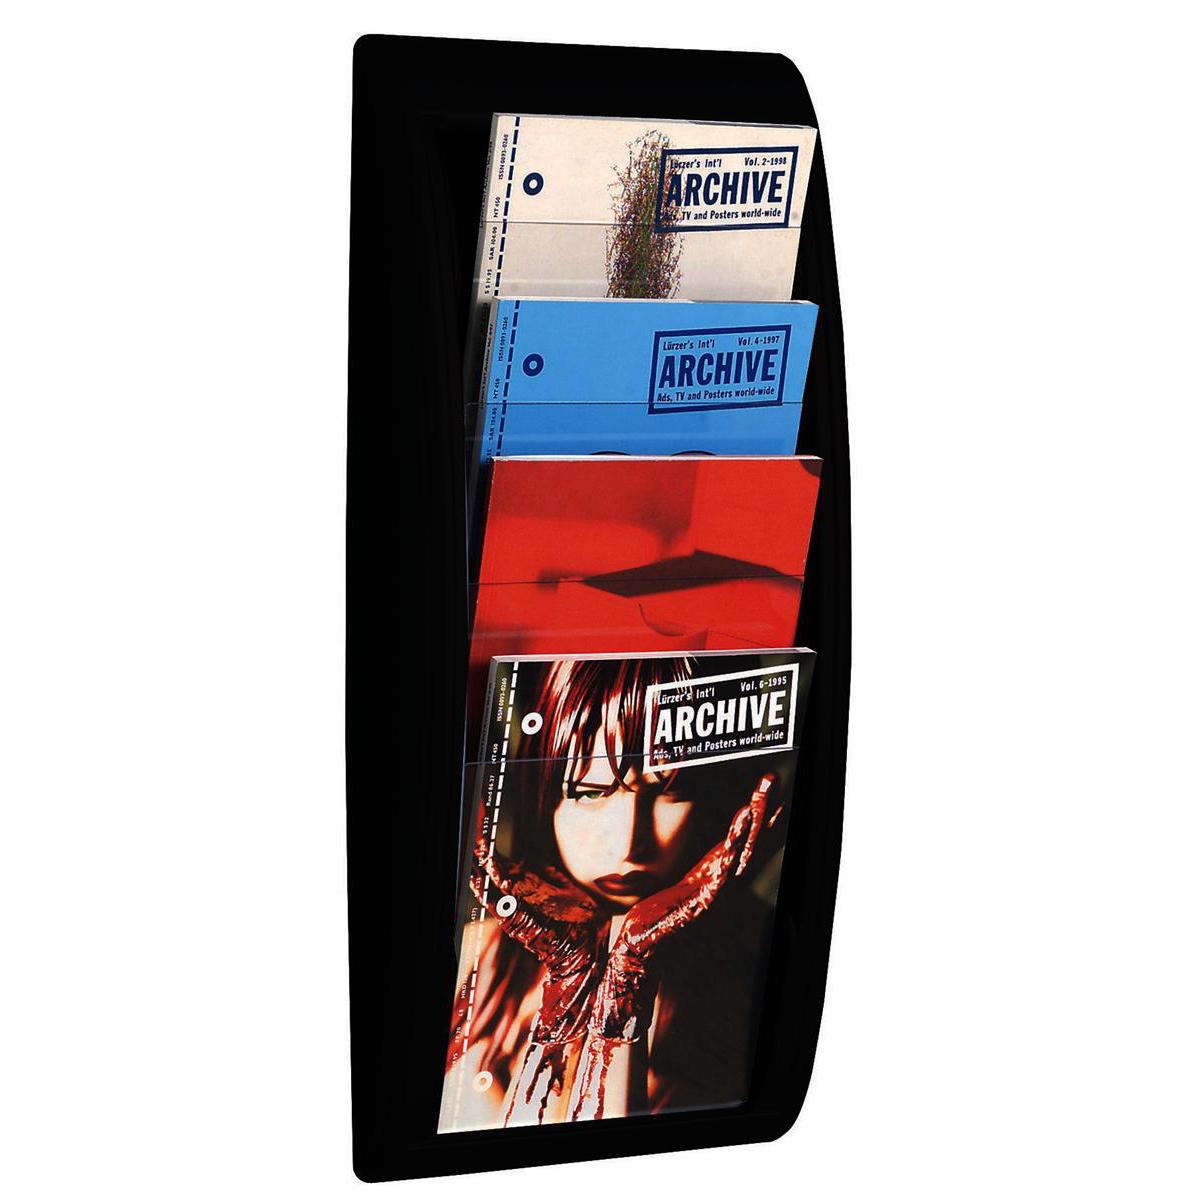 Fast Paper Literature Holder Wall Mount 4 x A4 Pockets Portrait Black Ref 4061.01